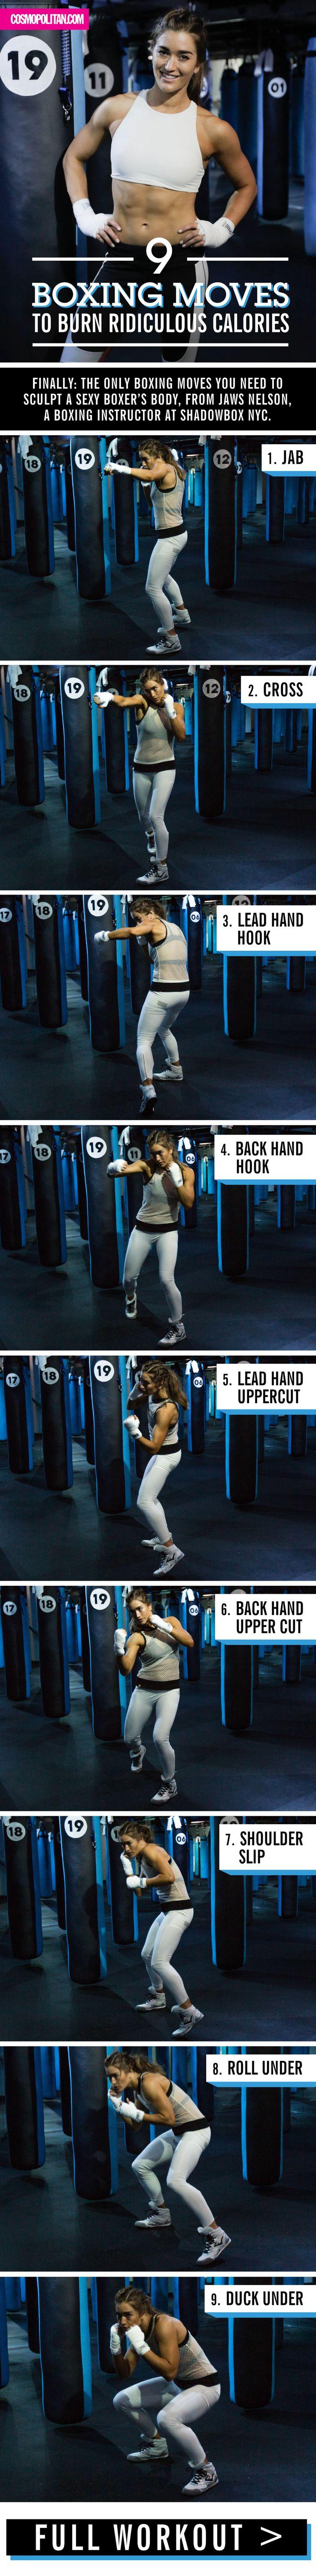 9+Boxing+Moves+to+Burn+Ridiculous+Calories  - Cosmopolitan.com